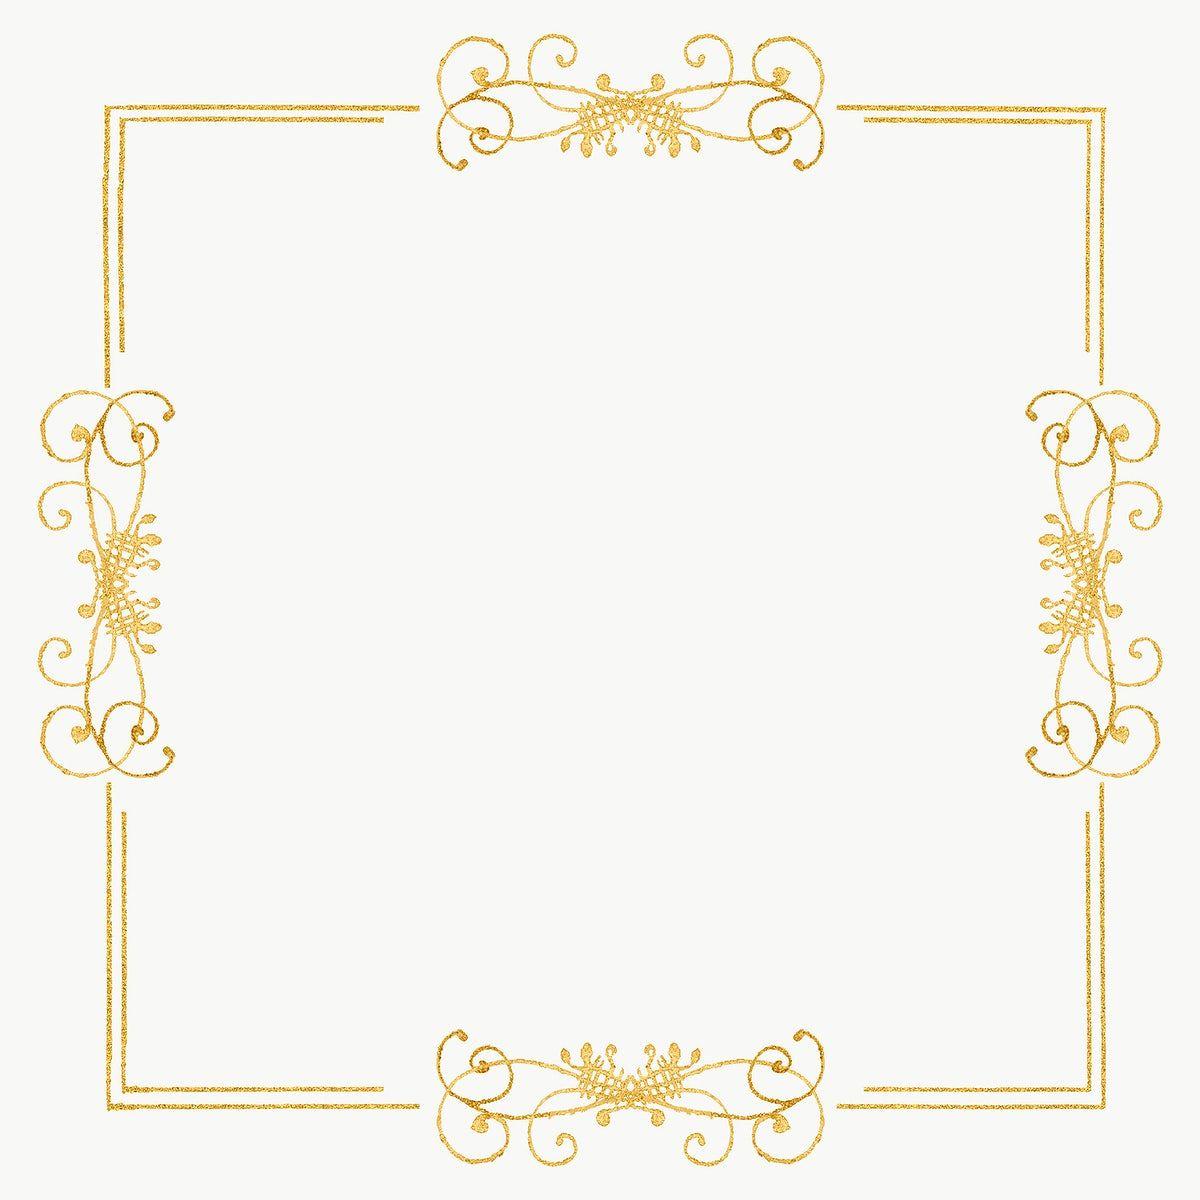 Gold Filigree Frame Border Png Free Image By Rawpixel Com Hwangmangjoo Free Illustrations Antique Artwork Gold Filigree